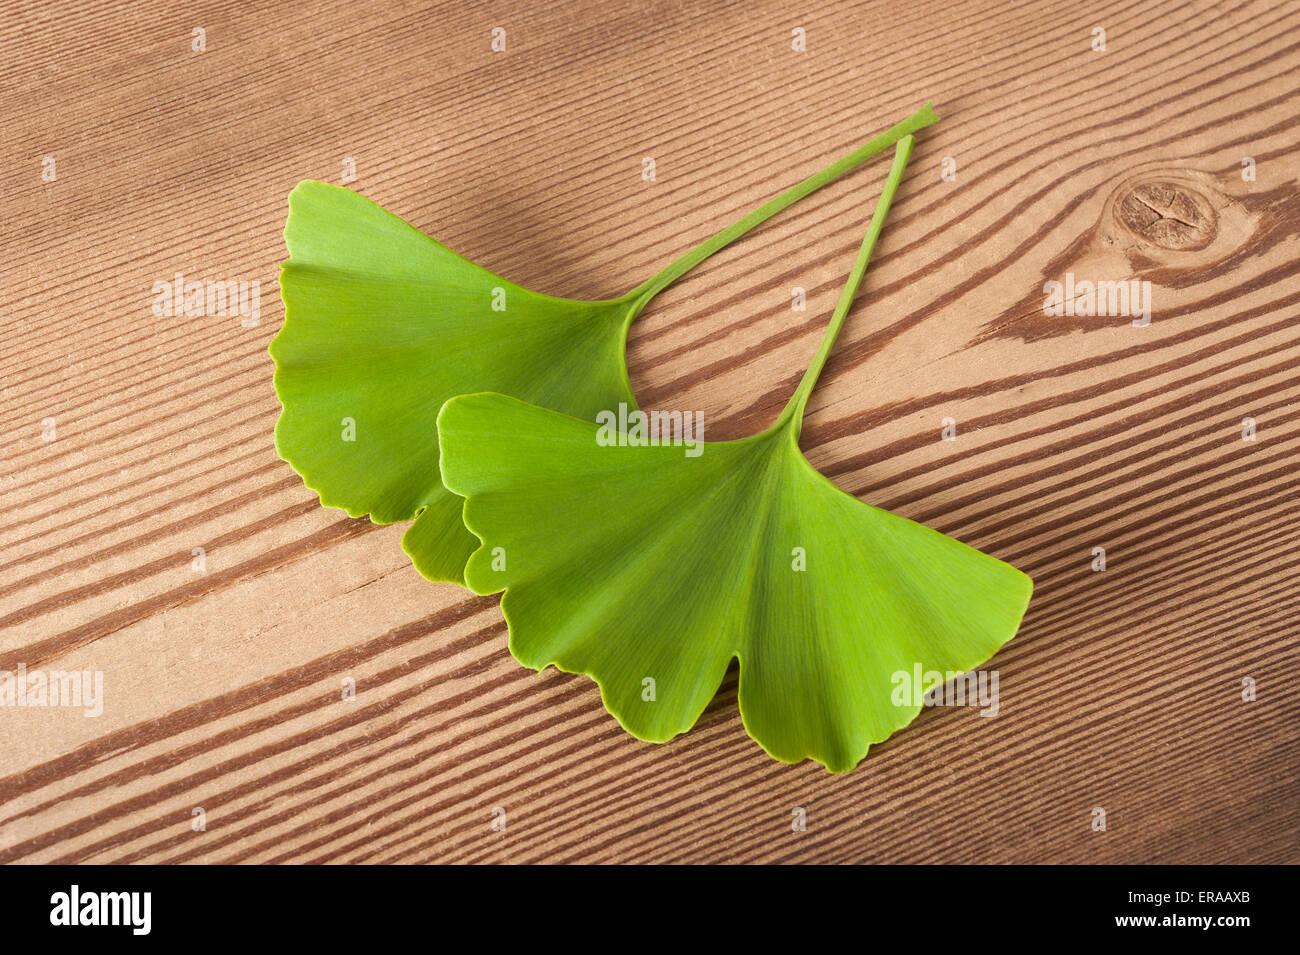 ginko biloba leaf green wood stockfotos ginko biloba leaf green wood bilder alamy. Black Bedroom Furniture Sets. Home Design Ideas